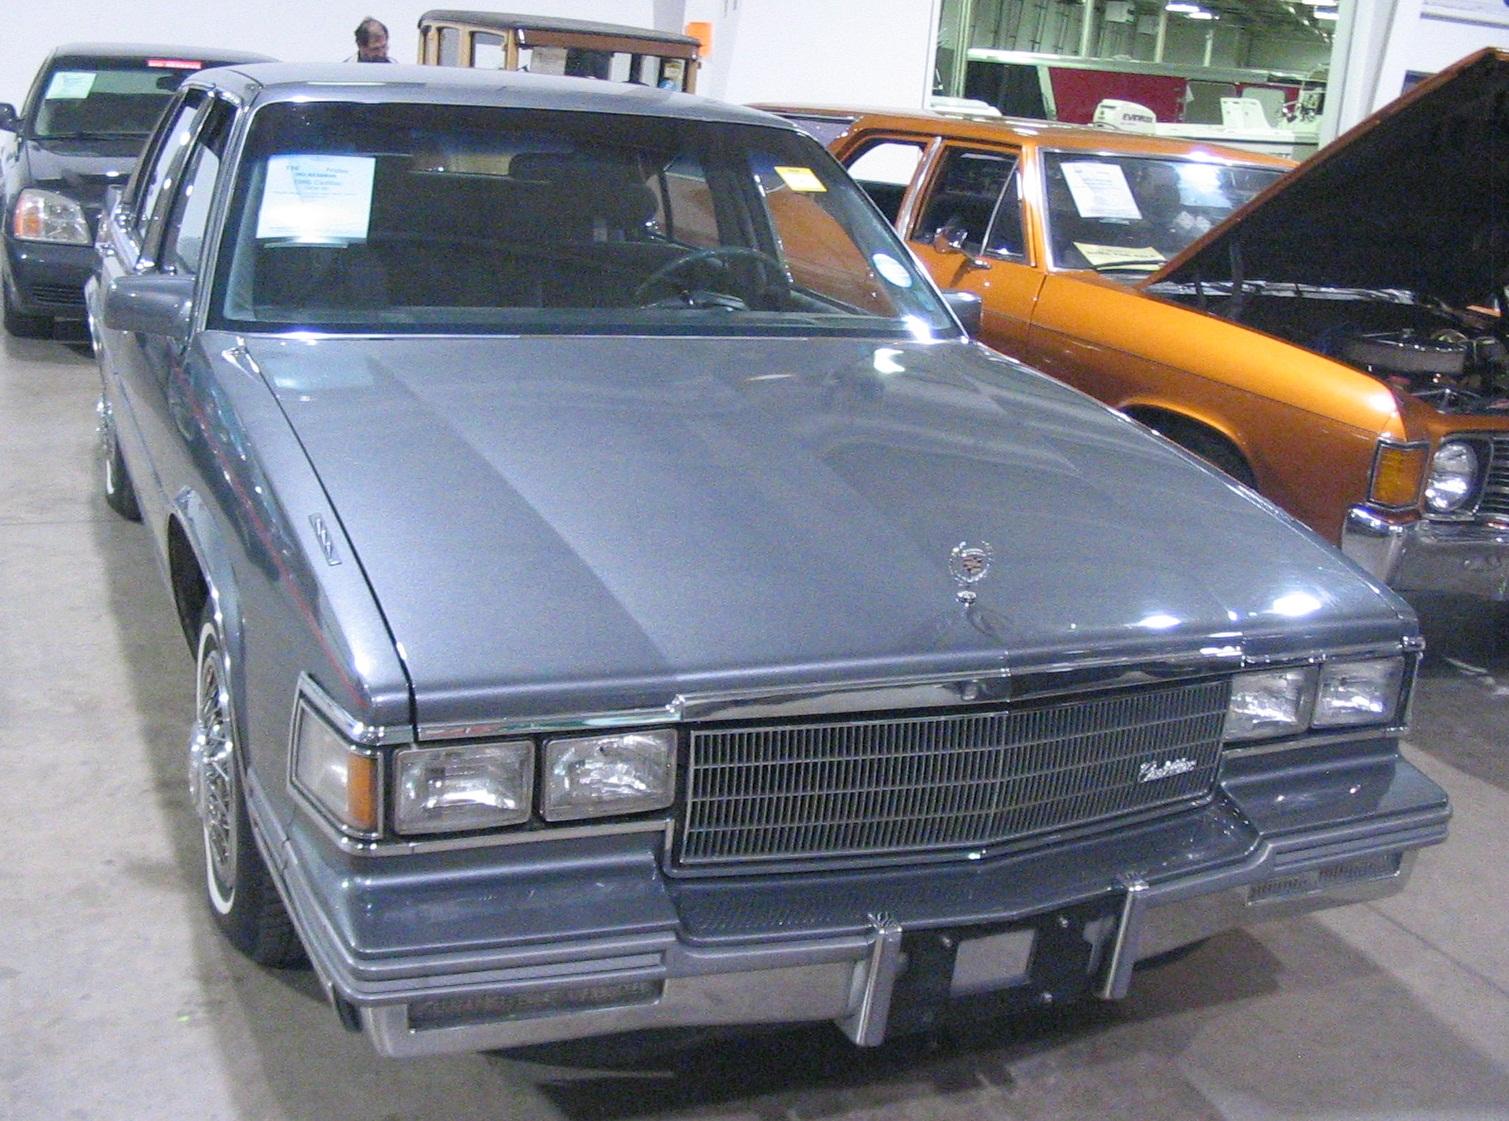 Cadillac Fleetwood Wikipedia 1955 Engine Sedan 19851992